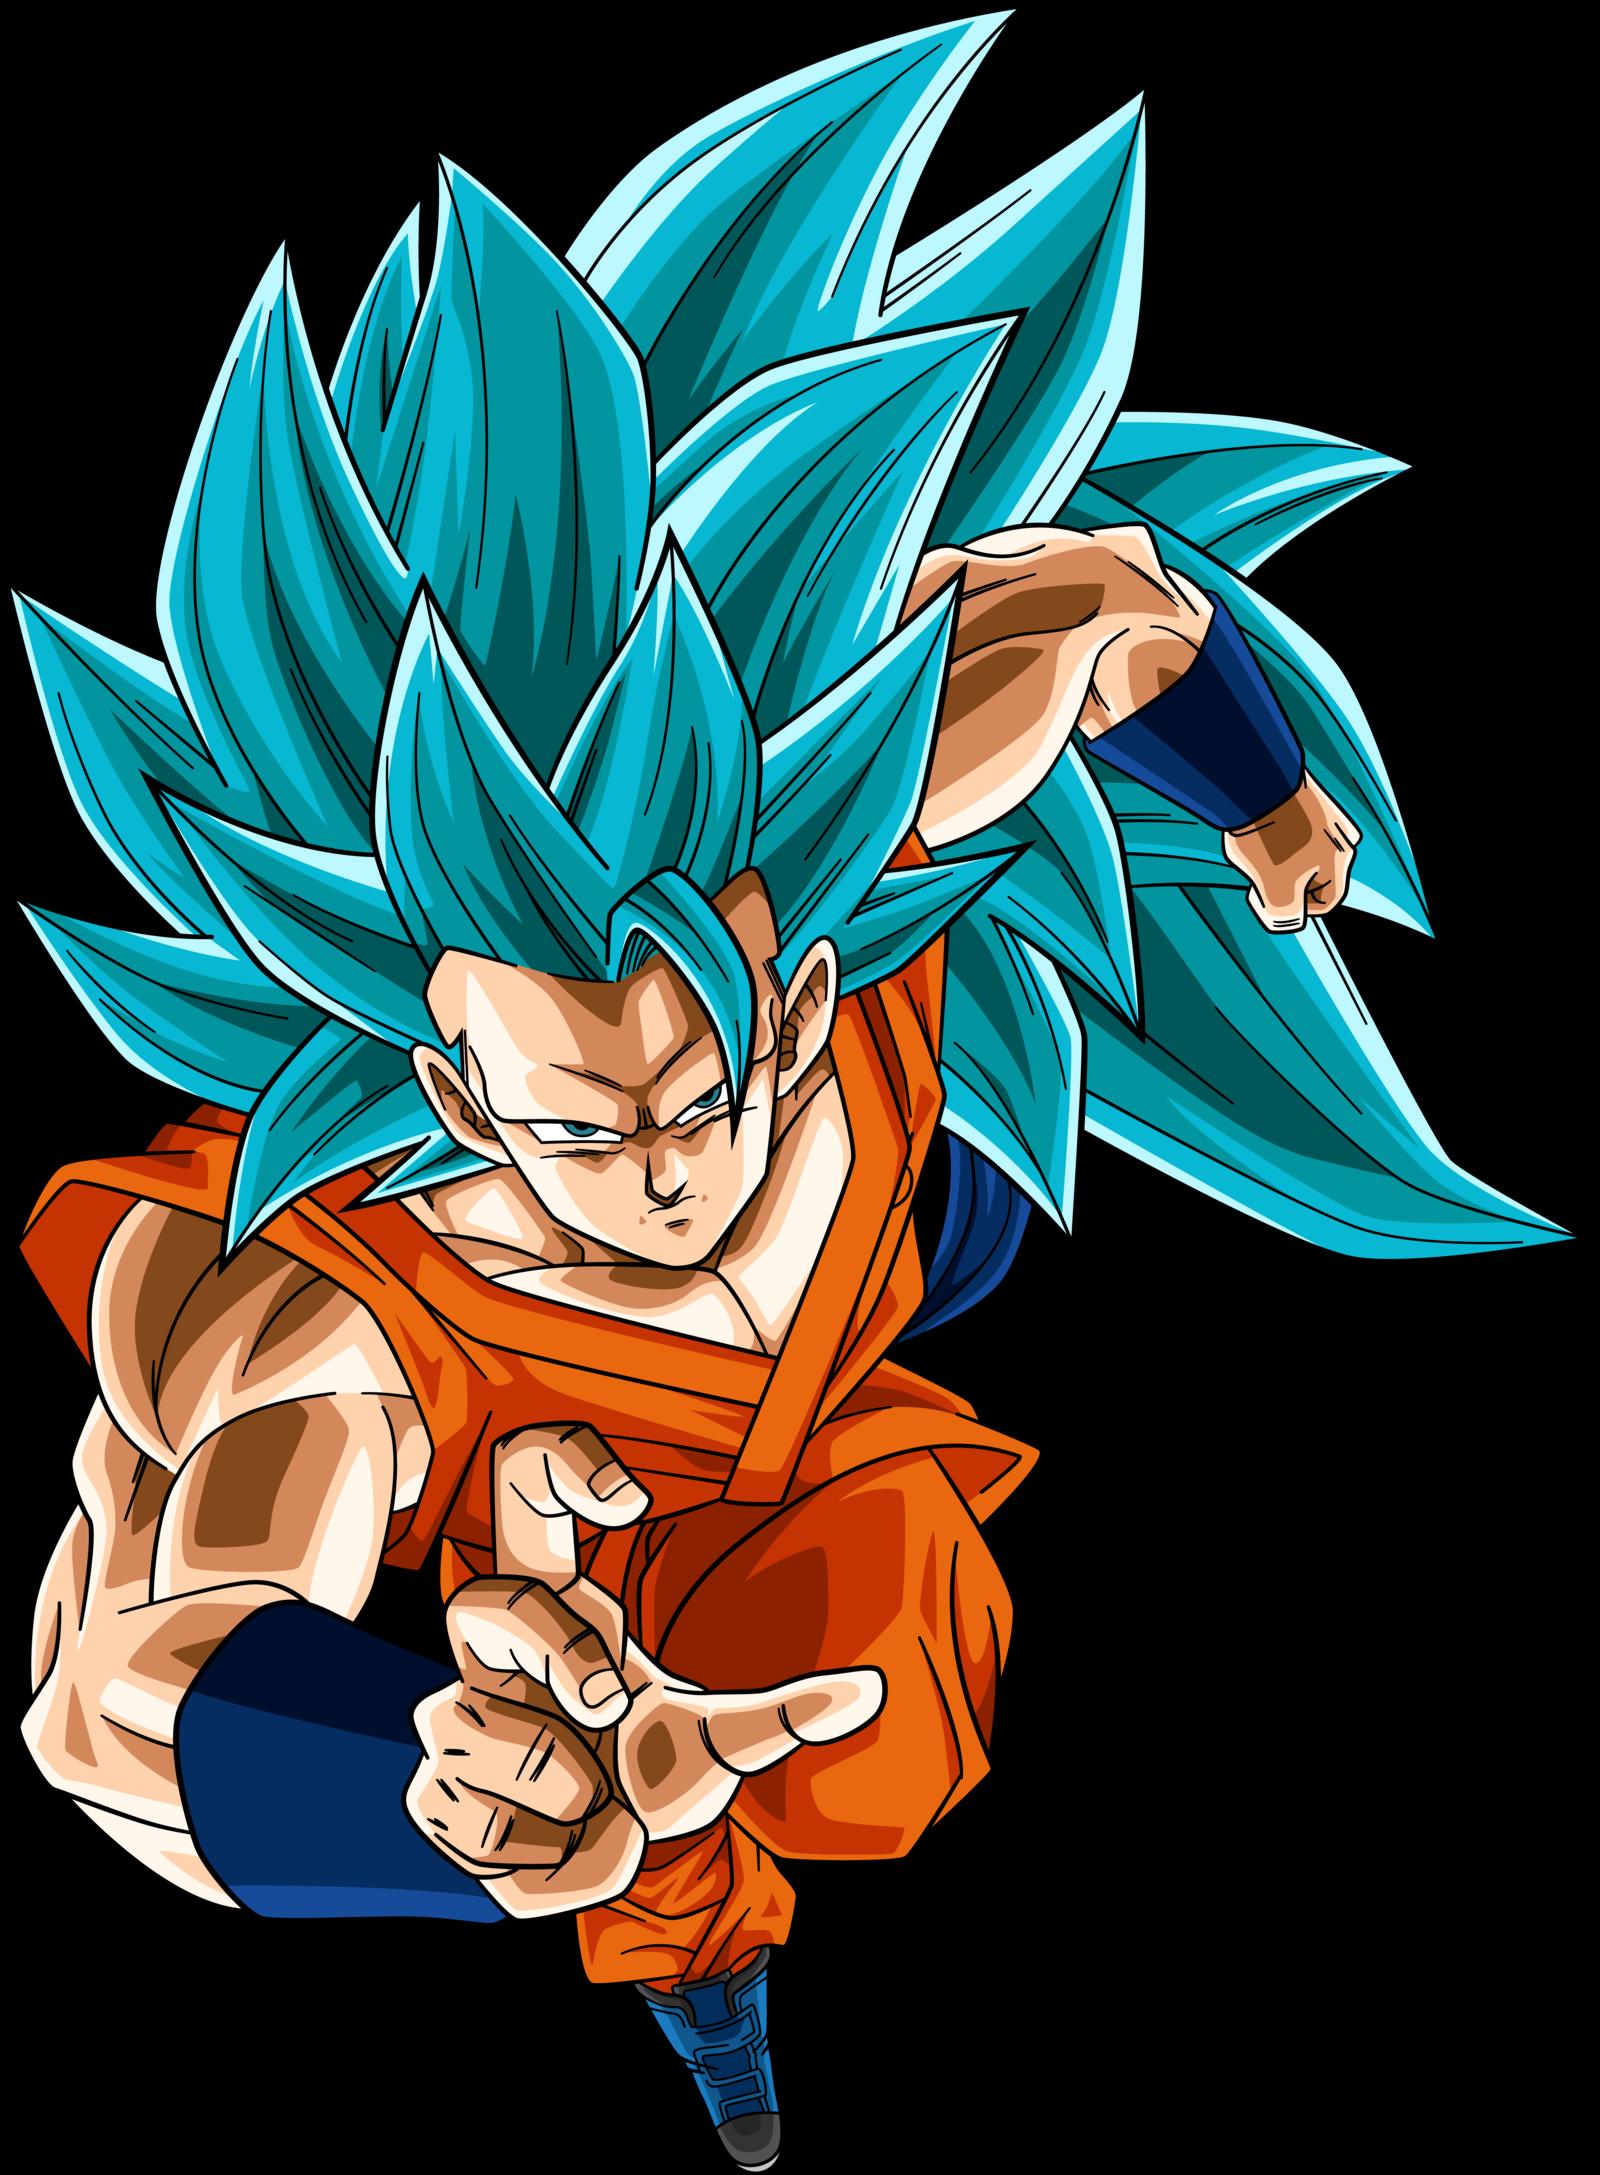 Image super saiyan blue 3 goku dragonball super by - Dragon ball z super sayen ...